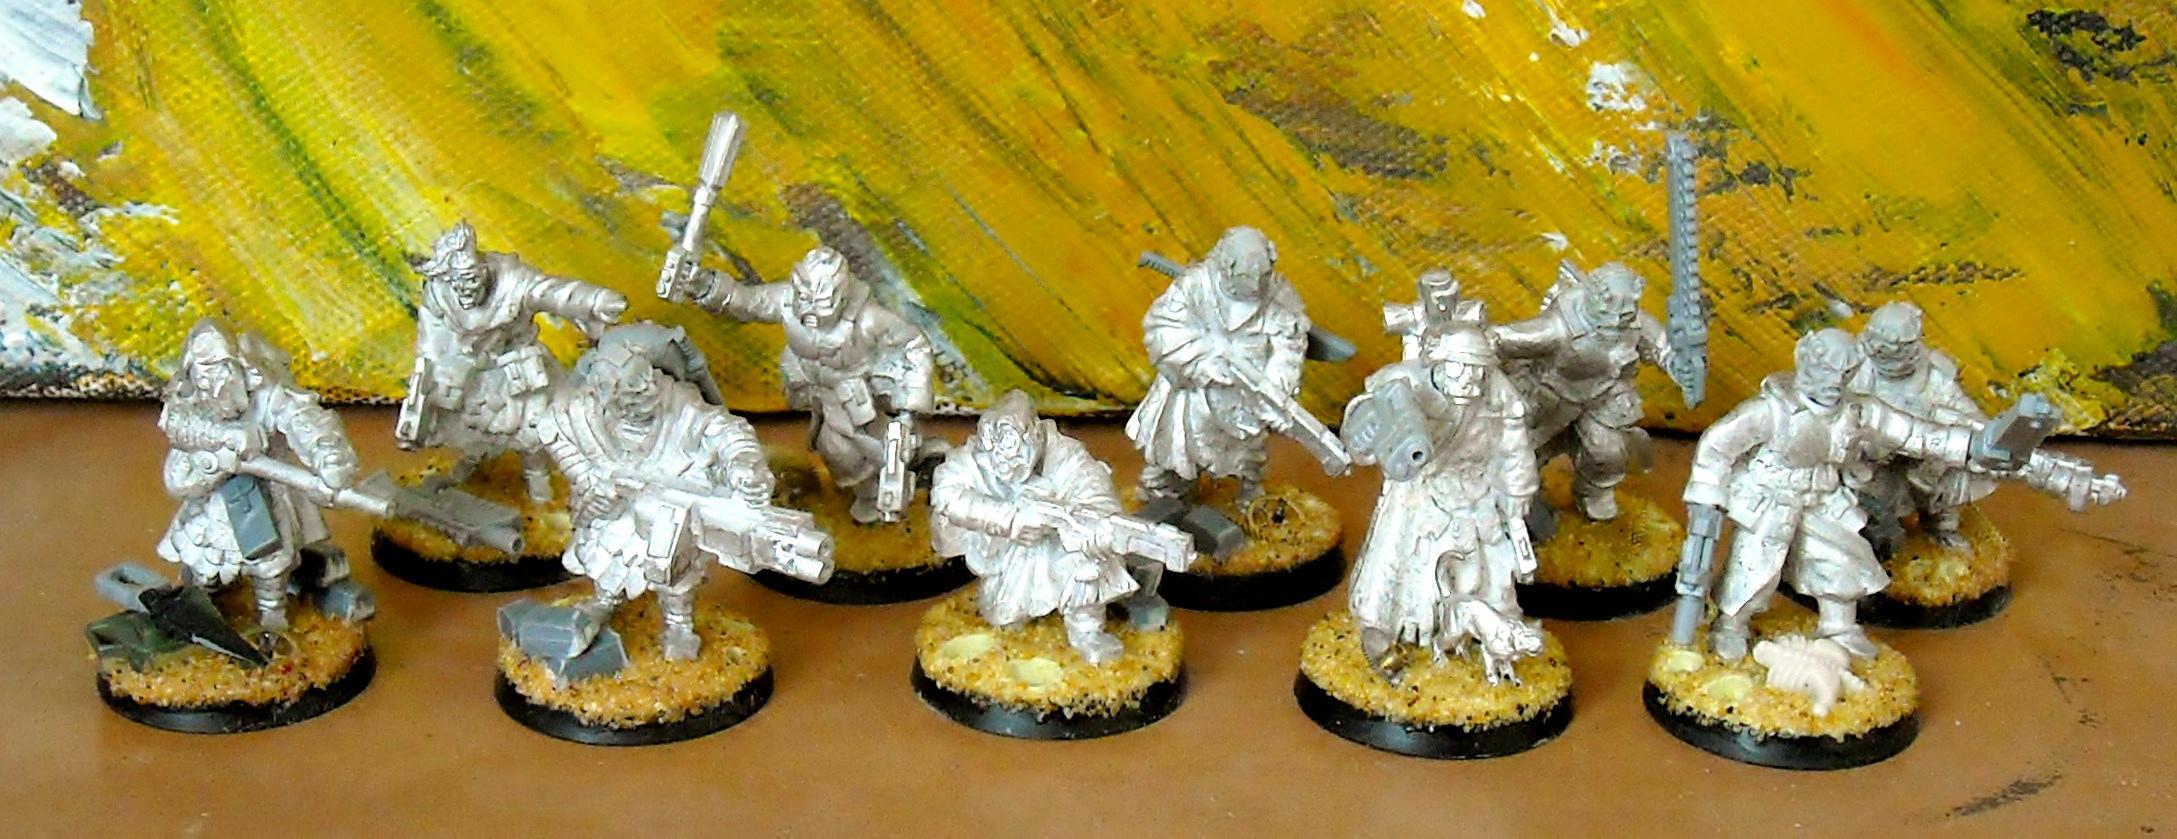 Cawdor counts as